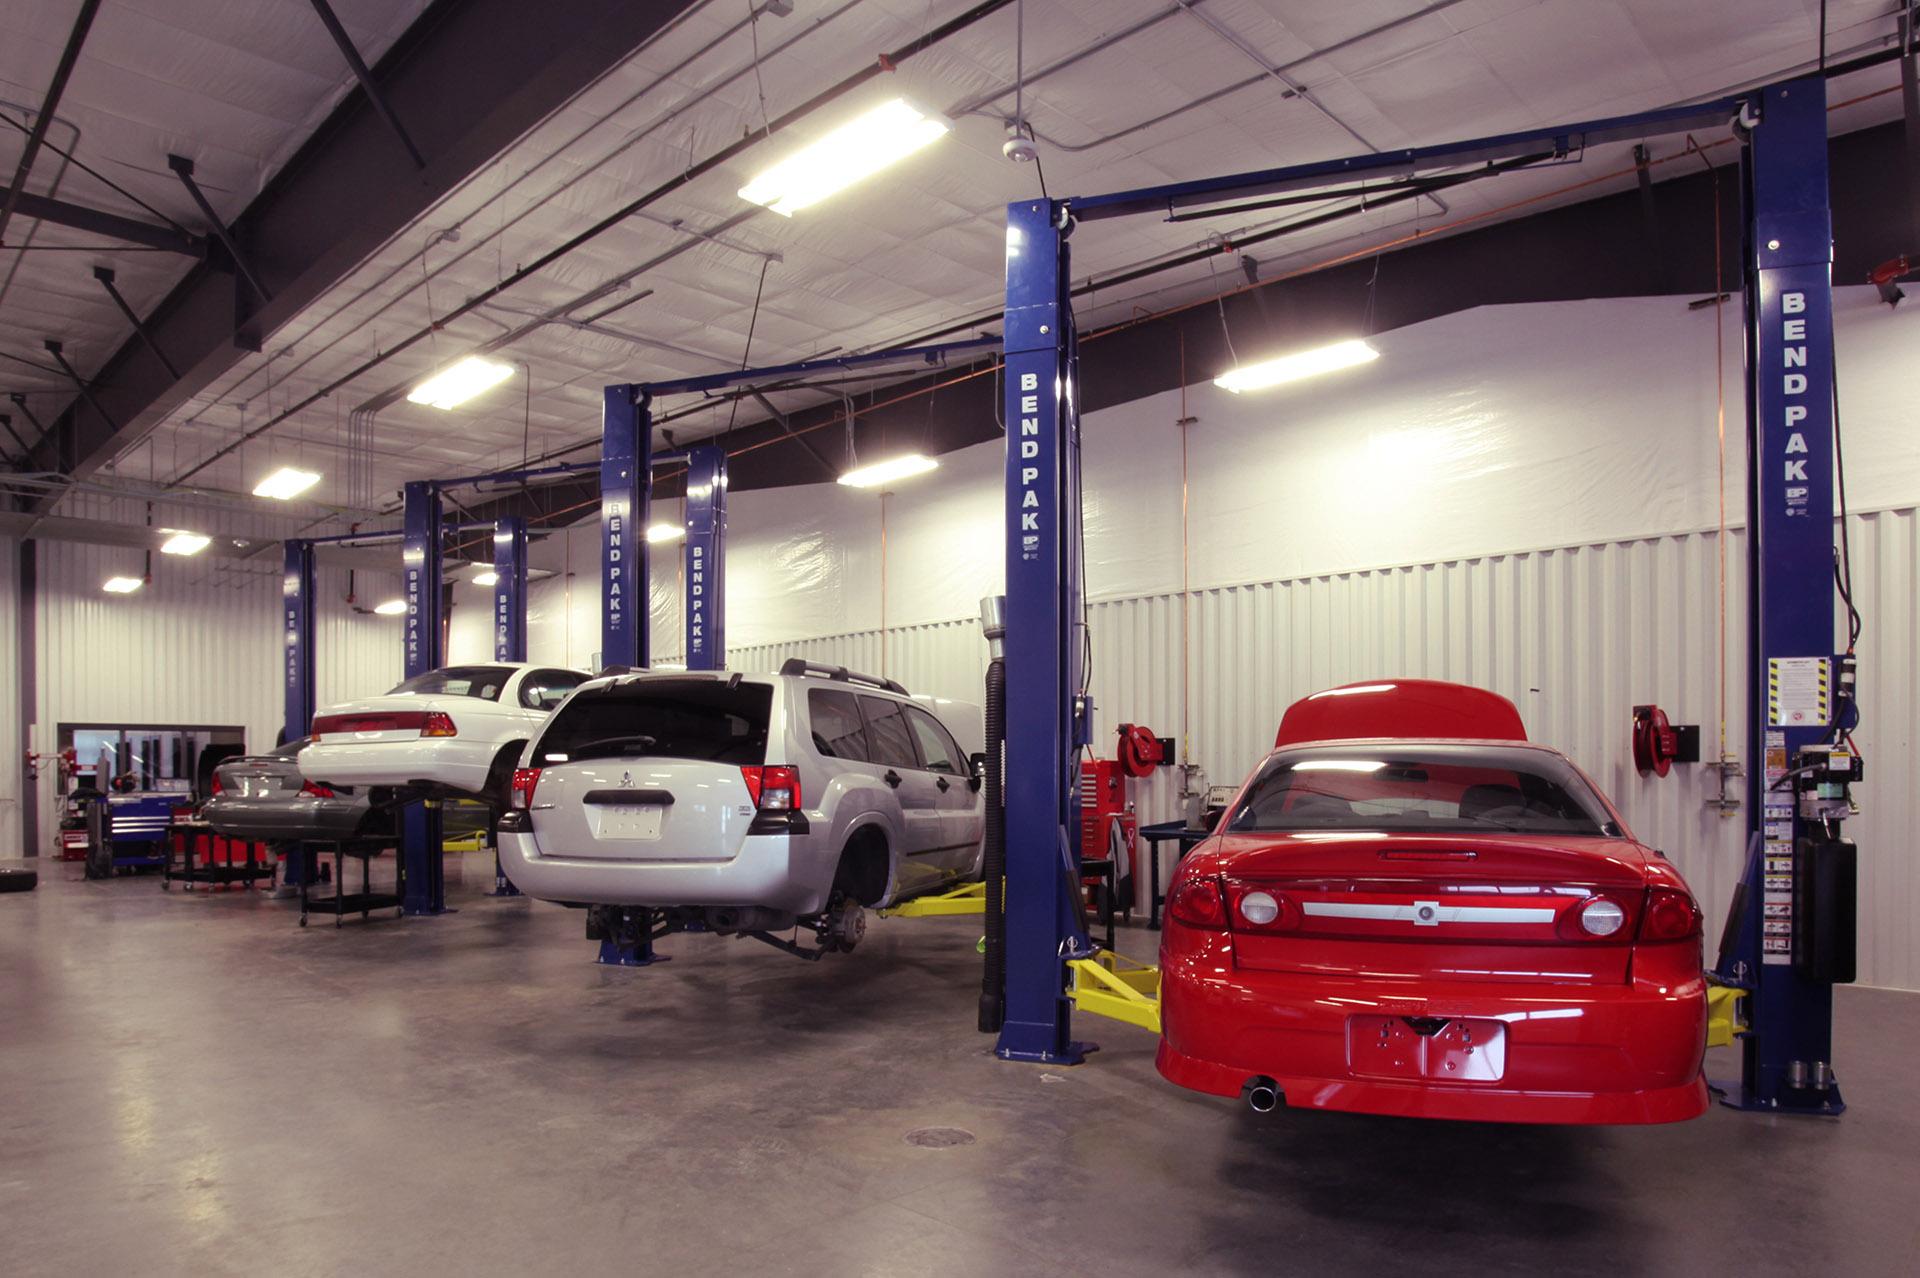 North Idaho College Parker Technical Education Center Automotive